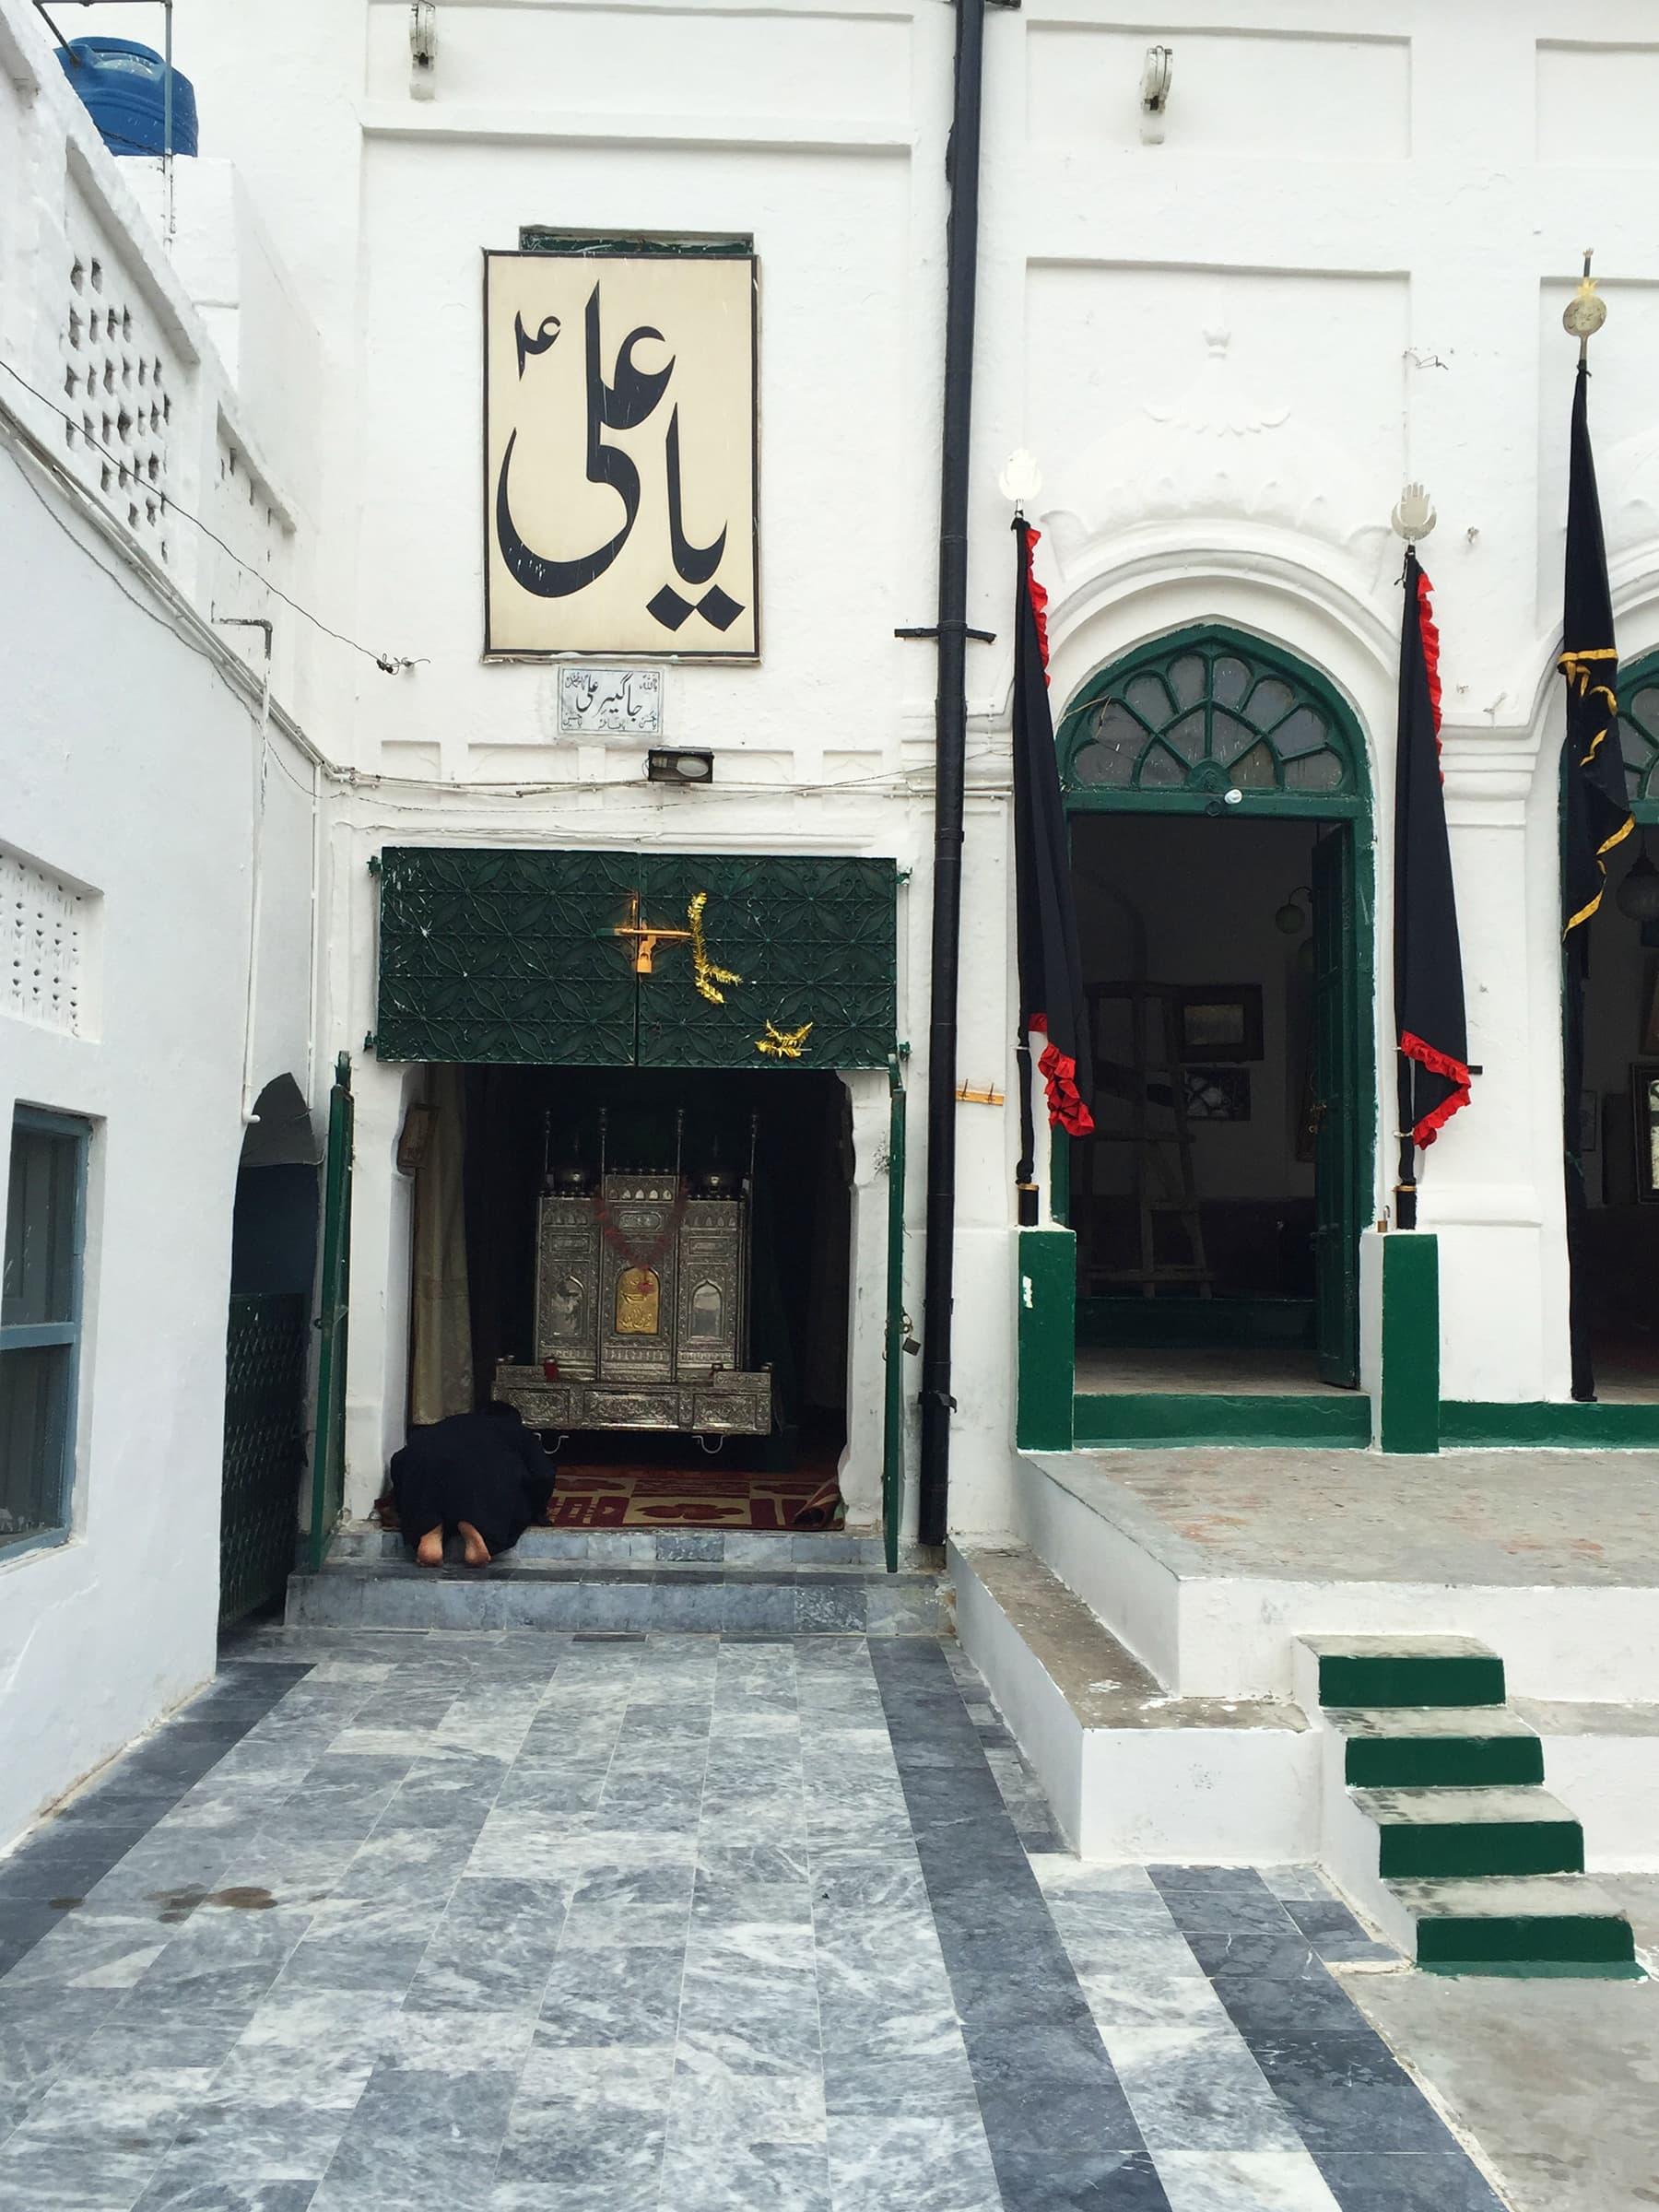 Inside Mubarak 'haveli' imambargah. —Taimur Shamil